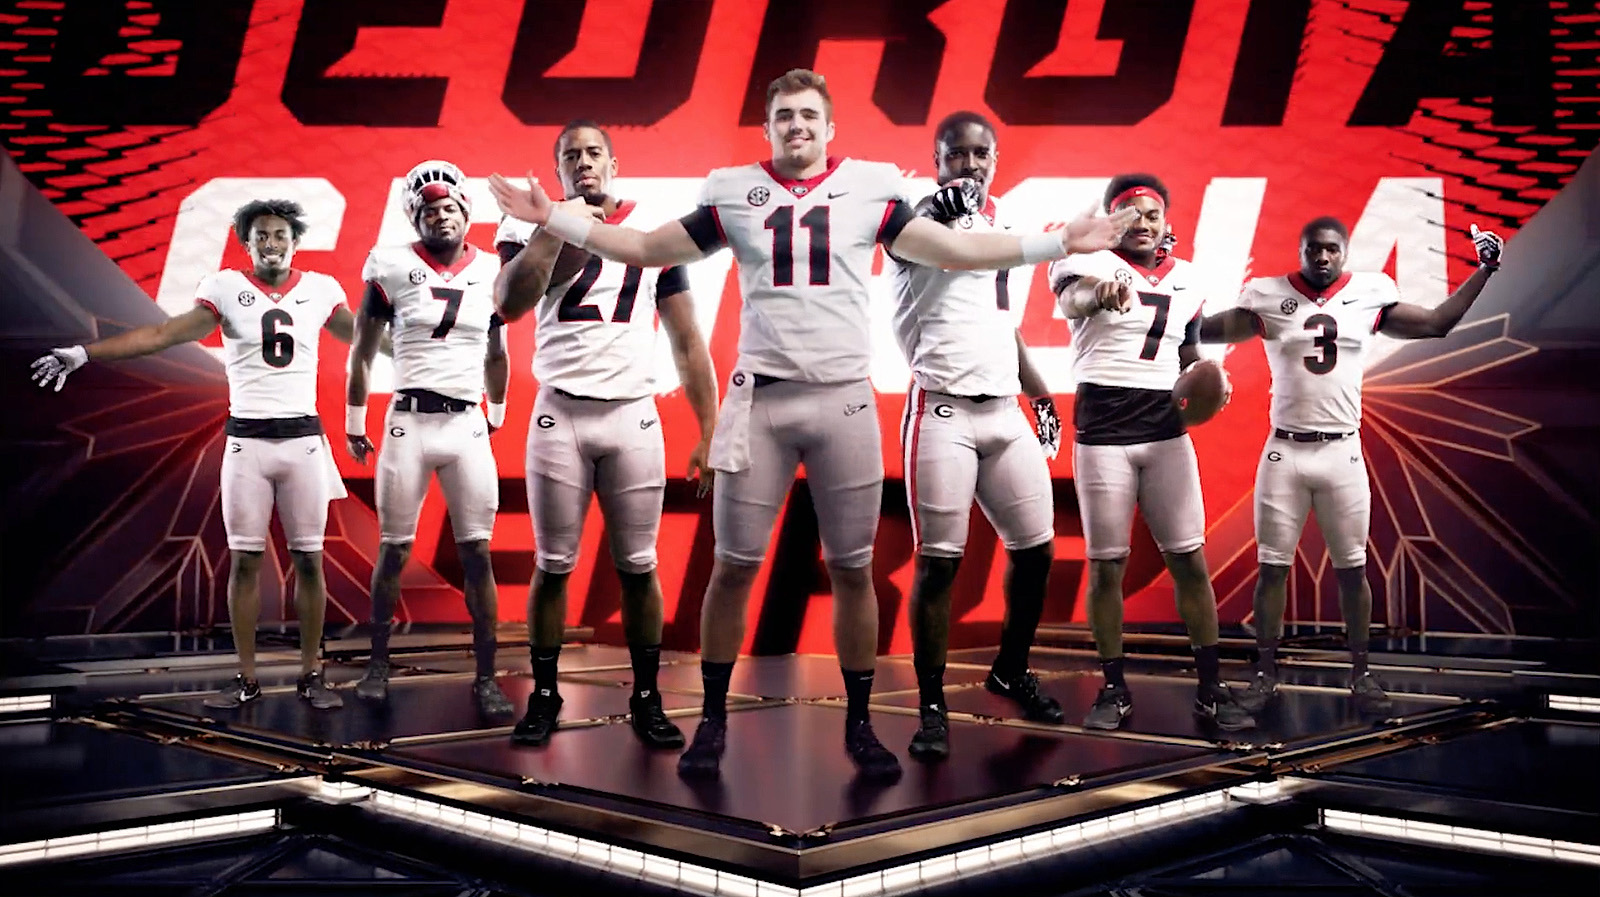 NCS_ESPN-College-Football-Playoffs-Troika_013